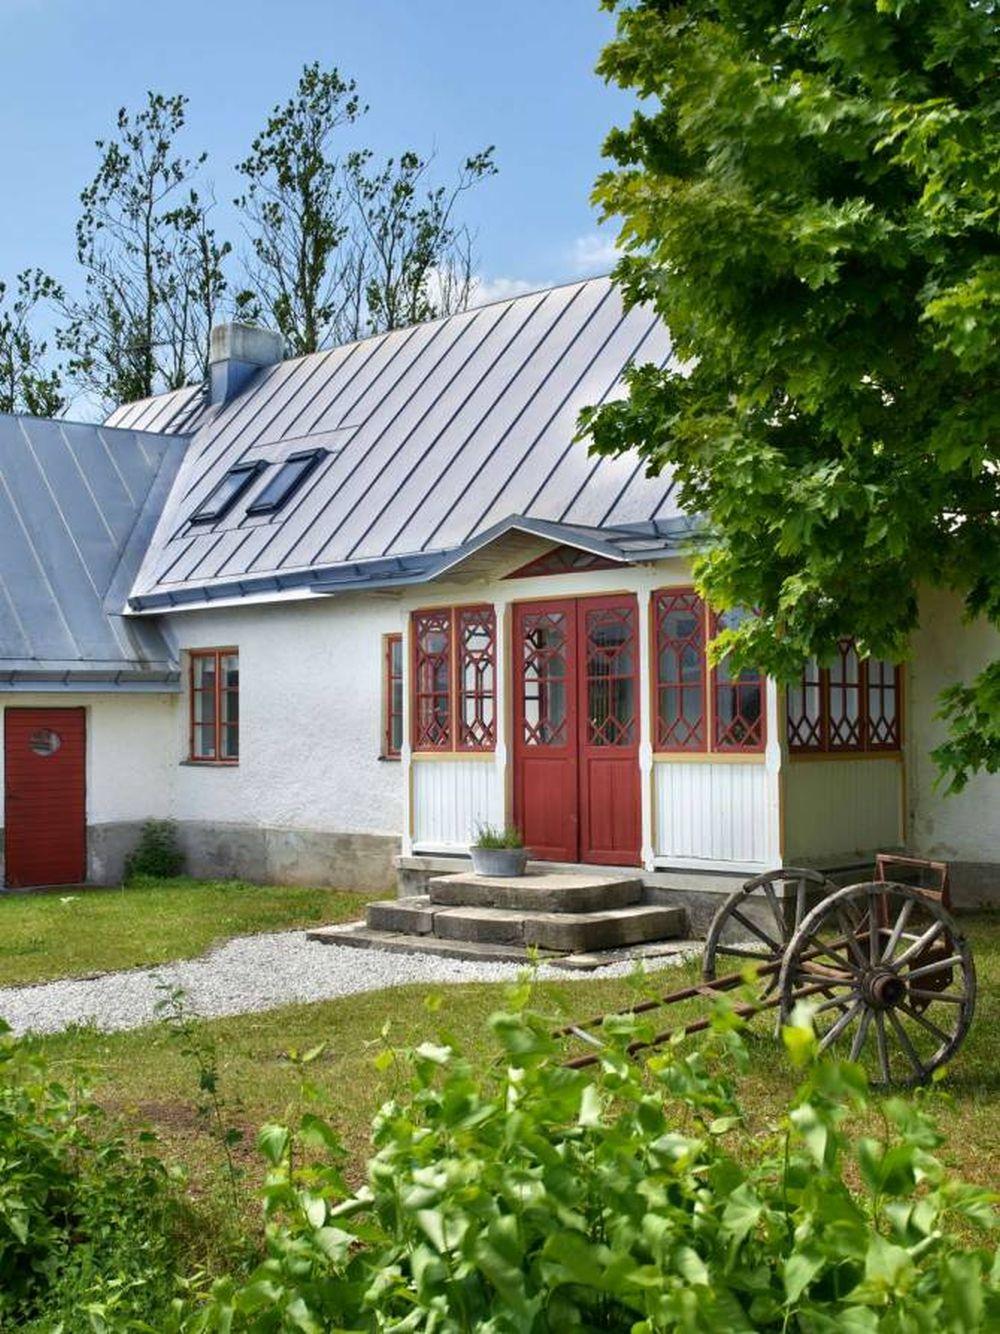 adelaparvu.com despre casa cu sarm rustic, Suedia, Foto Jonas Lundberg (9)